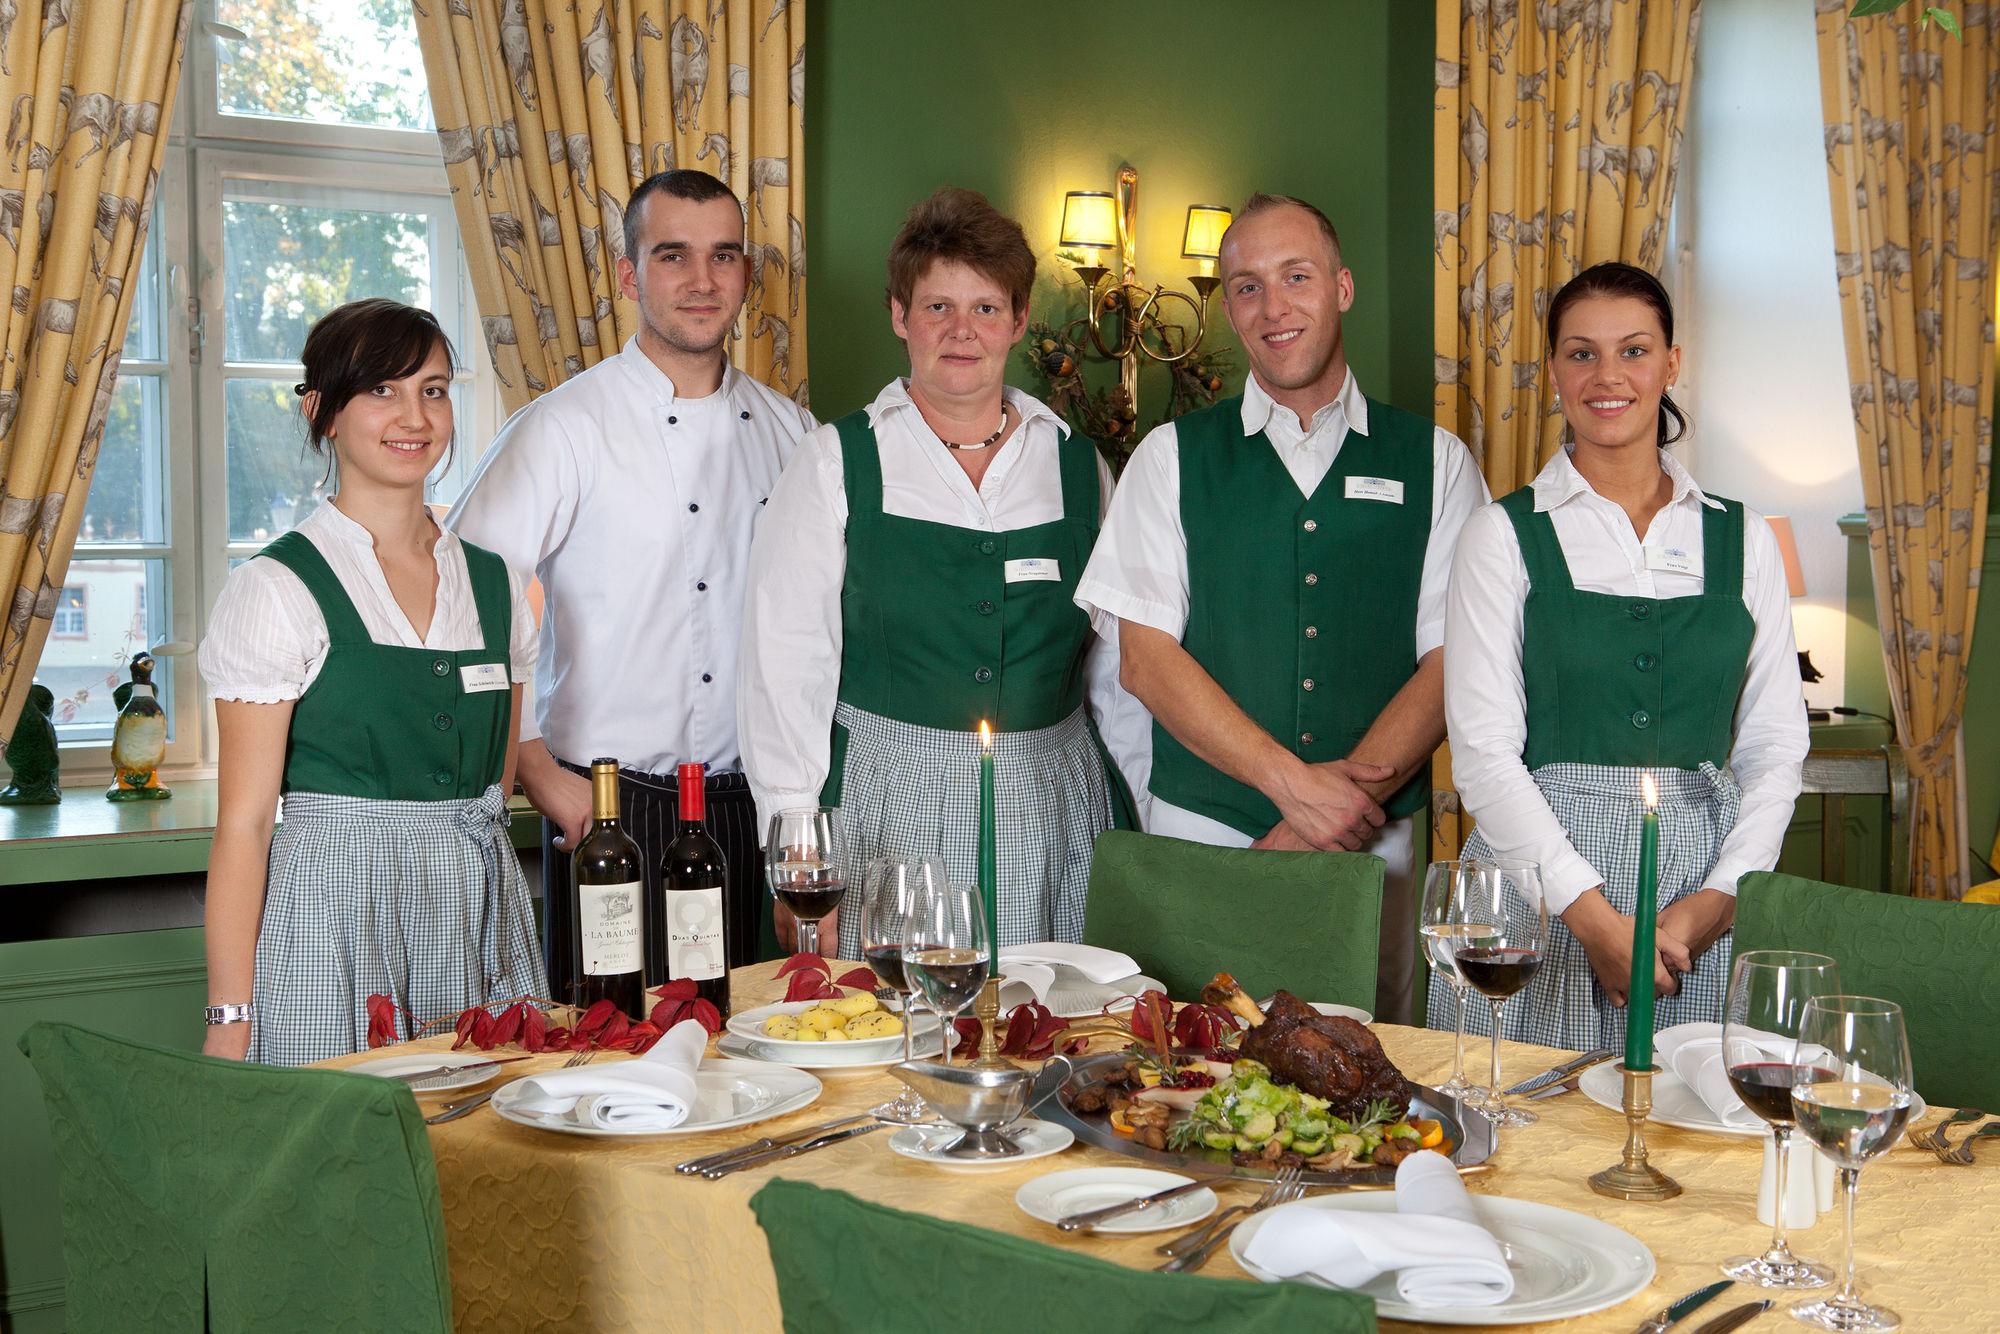 Urlaub im Schloss - Restaurant Spreewald - Urlaub Spreewald - Schlosshotel Brandenburg - Schloss Lübbenau im Spreewald - Jobs